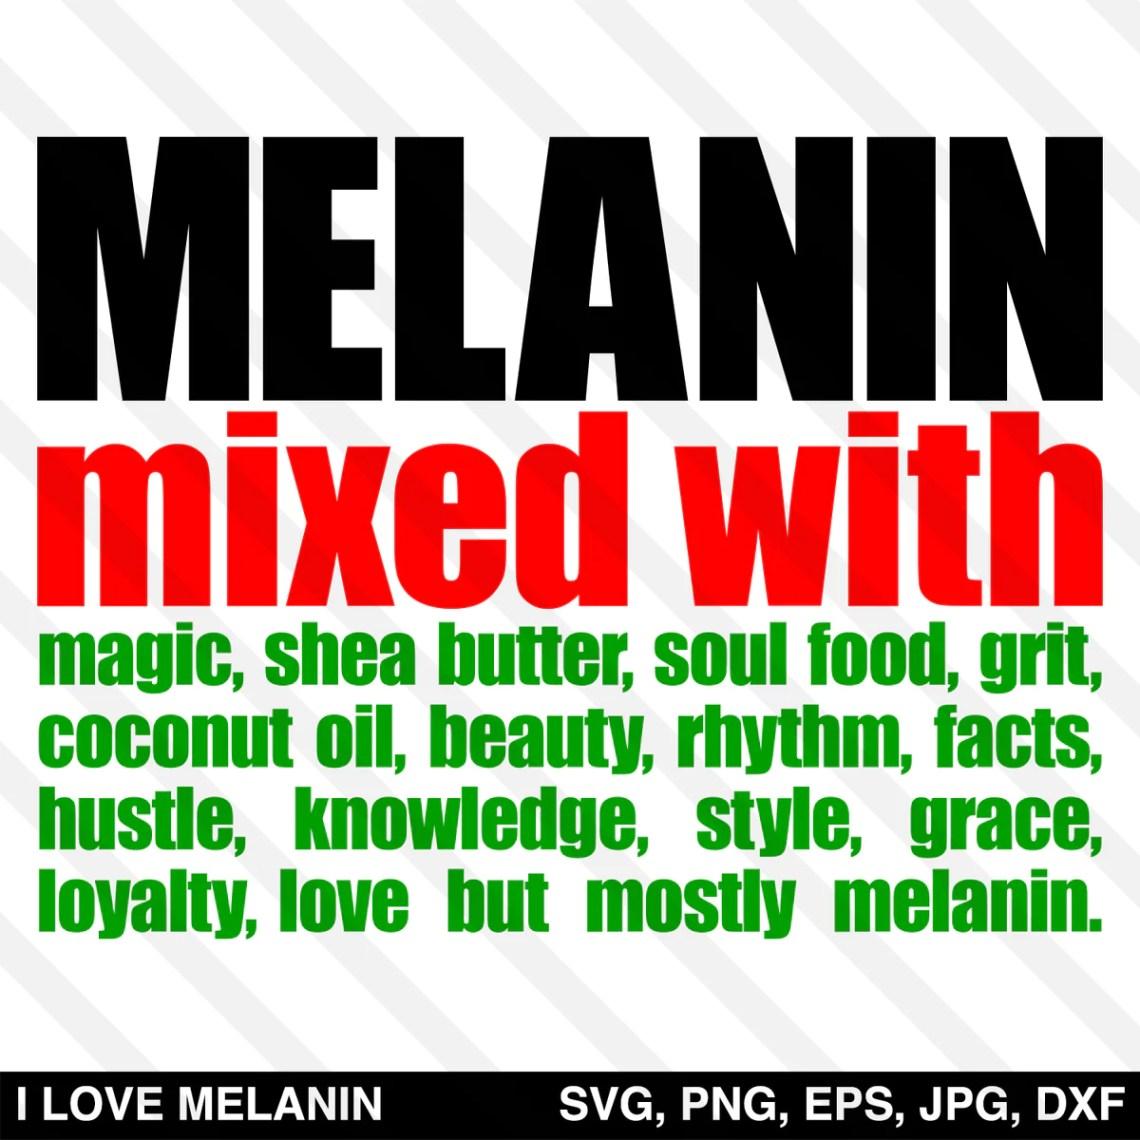 Download Melanin Mixed With Melanin SVG - I Love Melanin